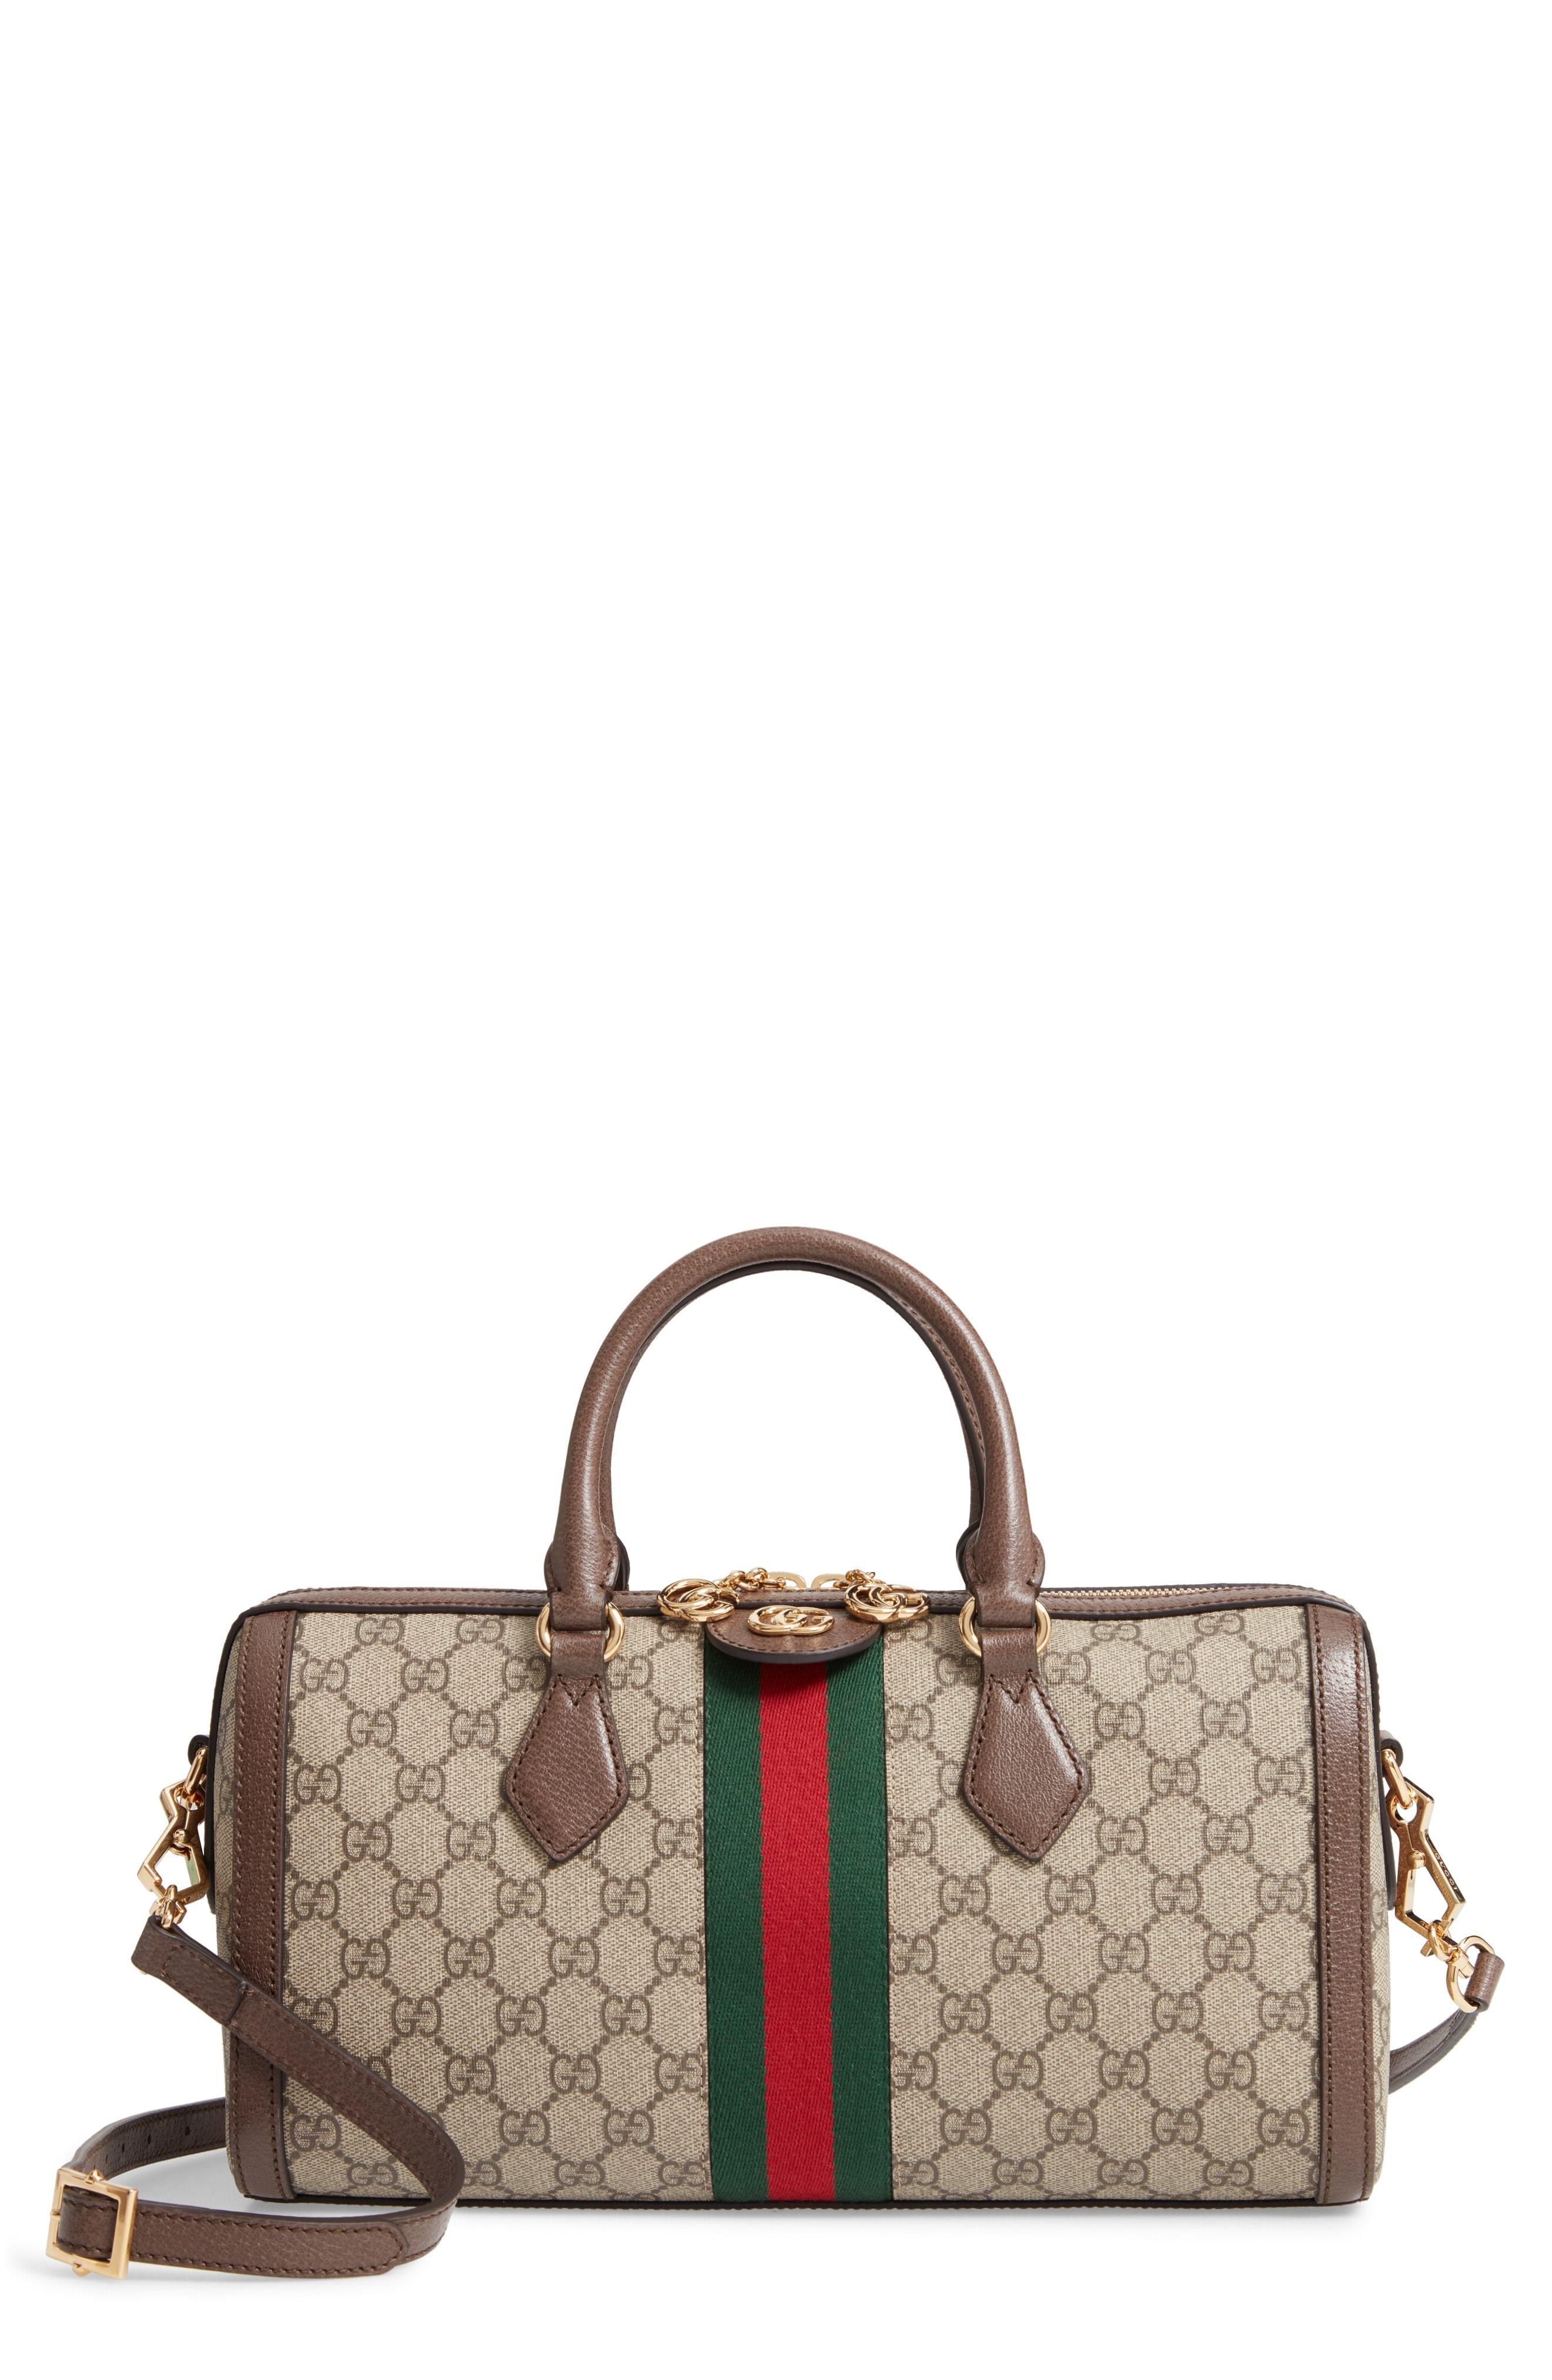 56fe2c84653e35 Gucci Ophidia Gg Supreme Canvas Bag, $1,980 | Nordstrom | Lookastic.com